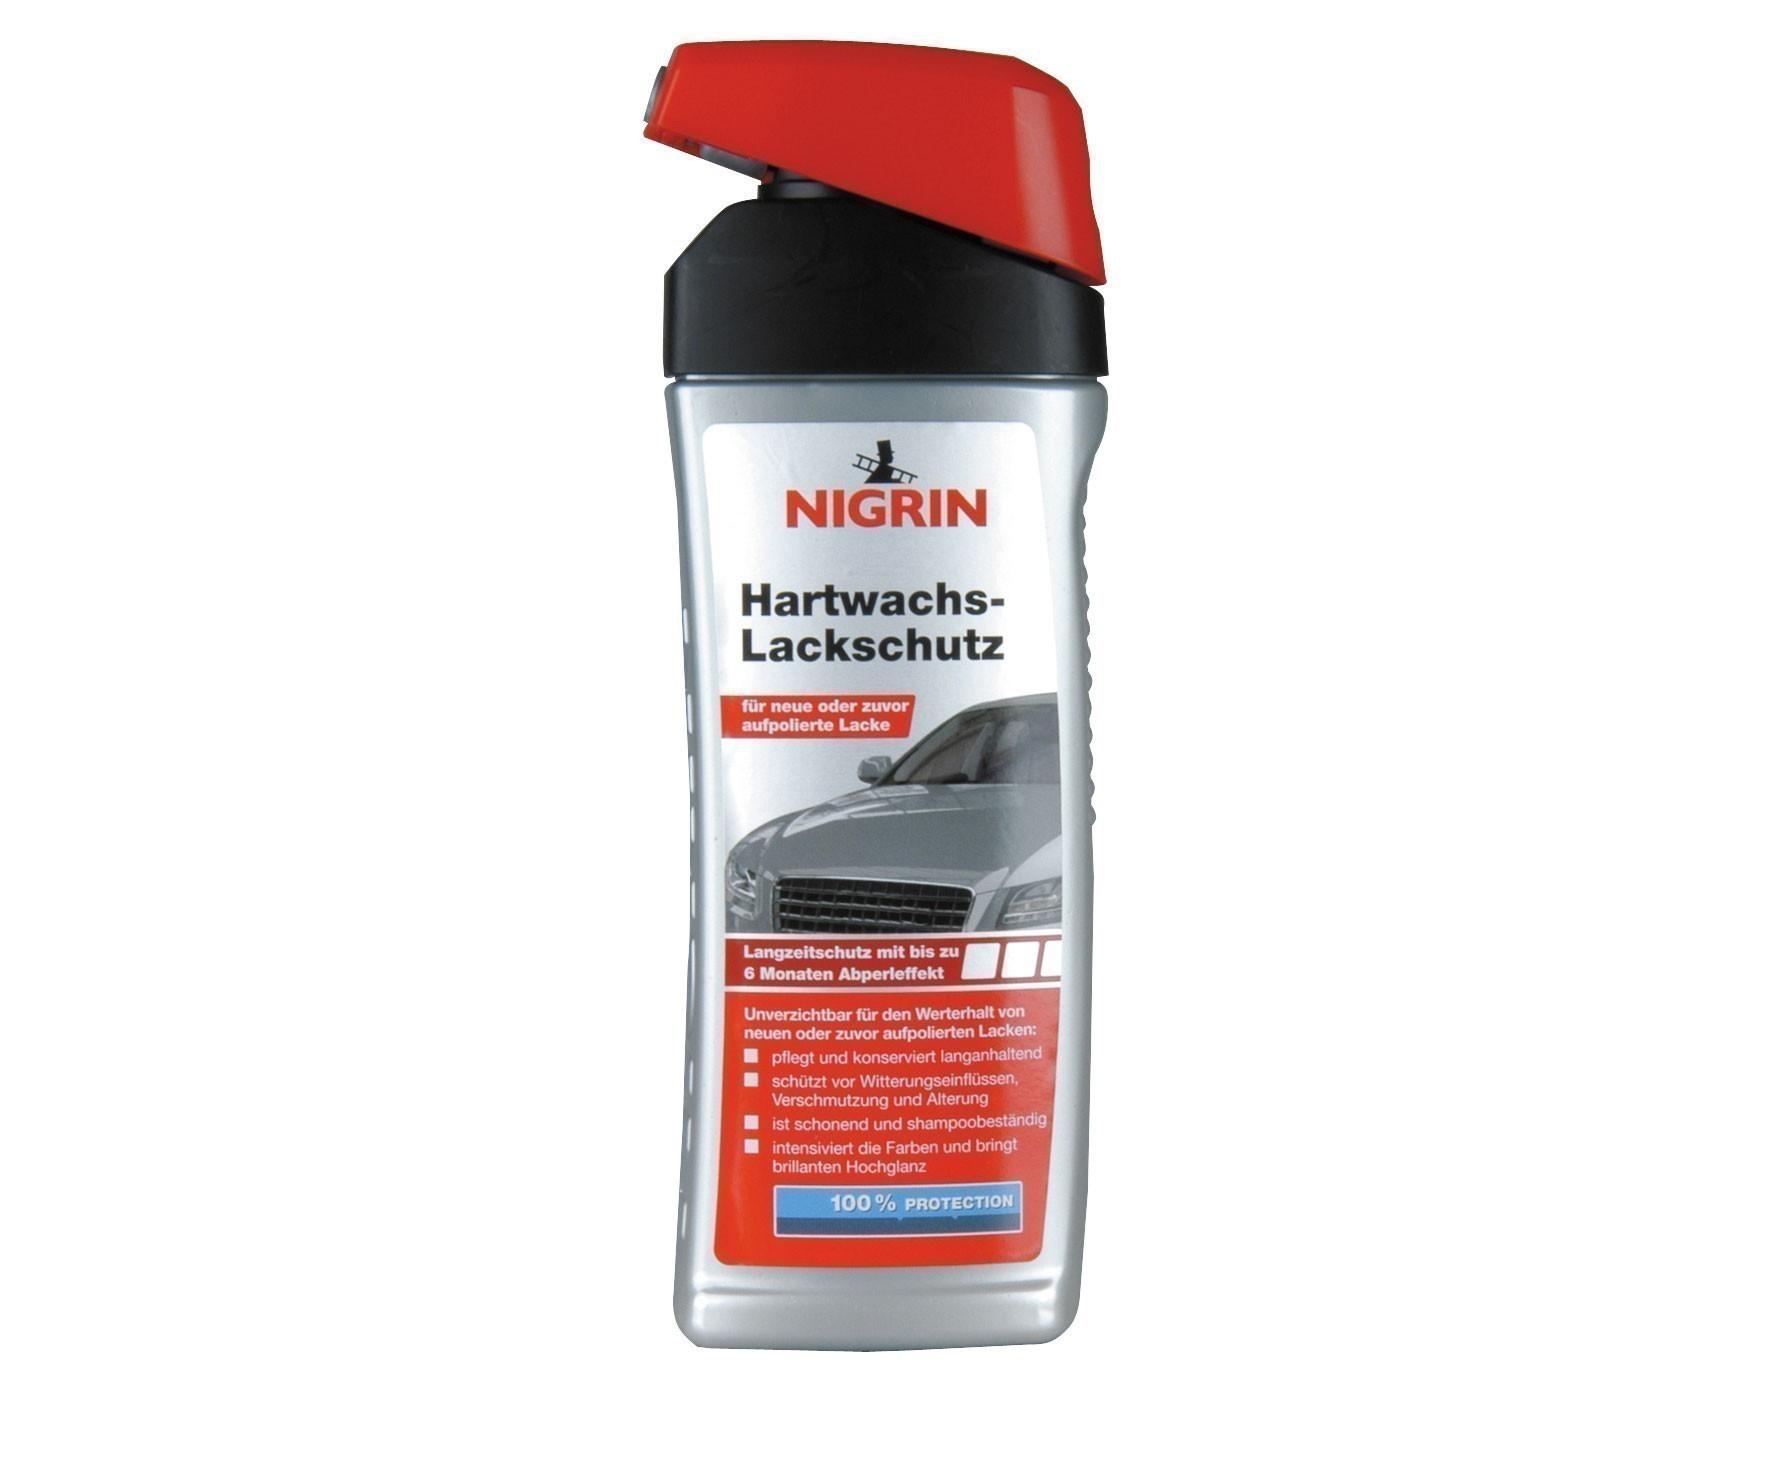 Nigrin Lackpflege Hartwachs-Lackschutz 500ml Bild 1